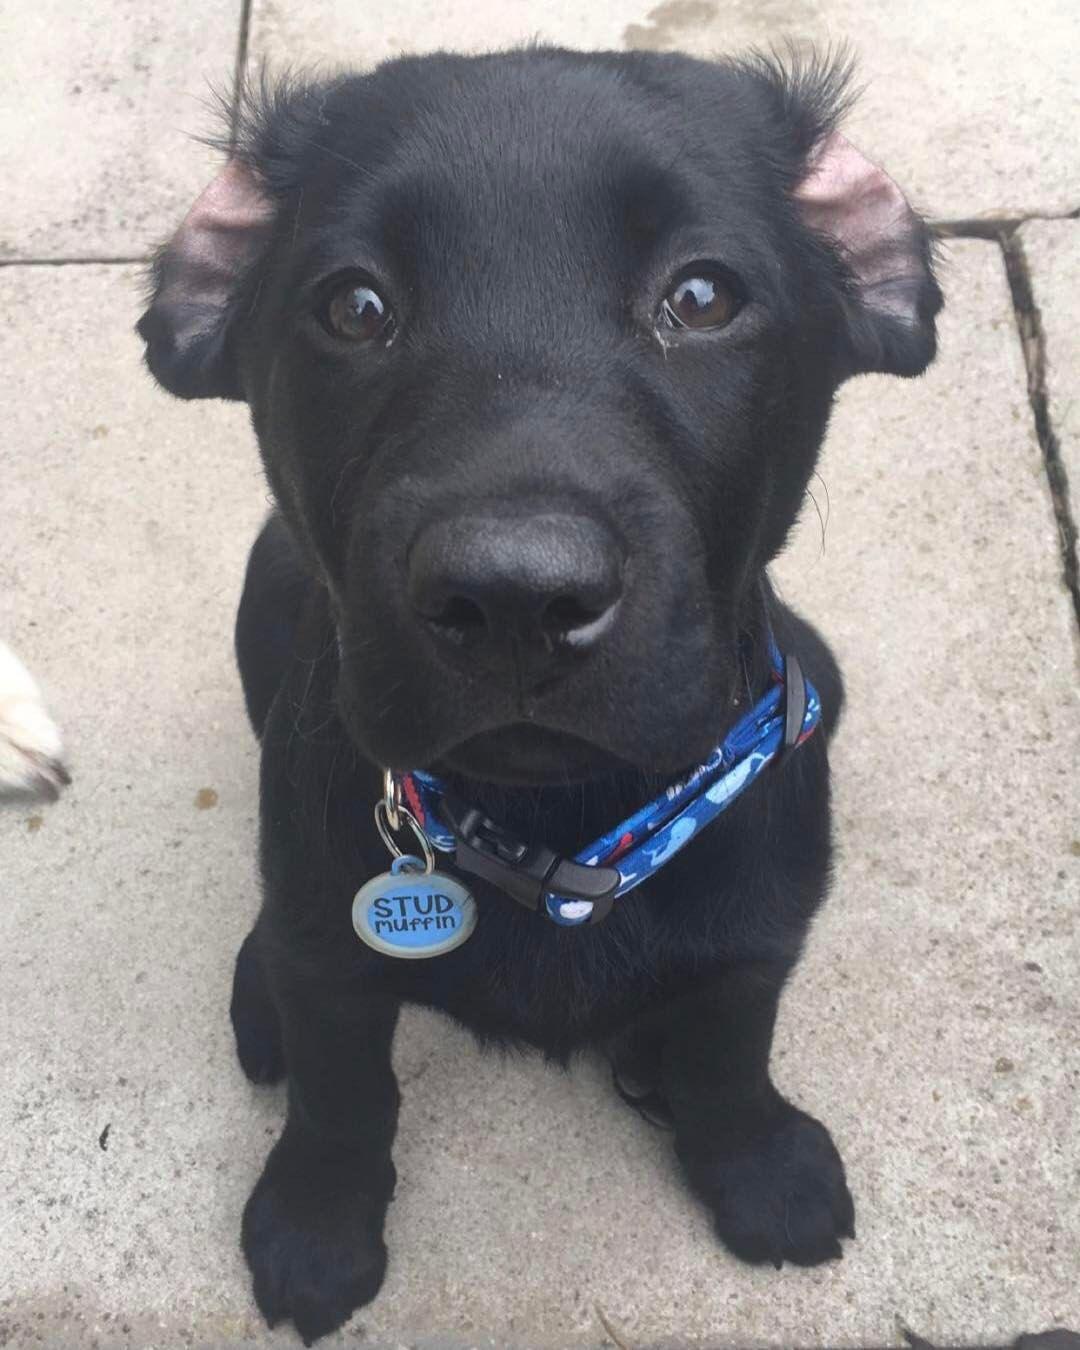 Top Labrador Black Adorable Dog - f60c254e0f0805837172722959307498  Picture_188284  .jpg